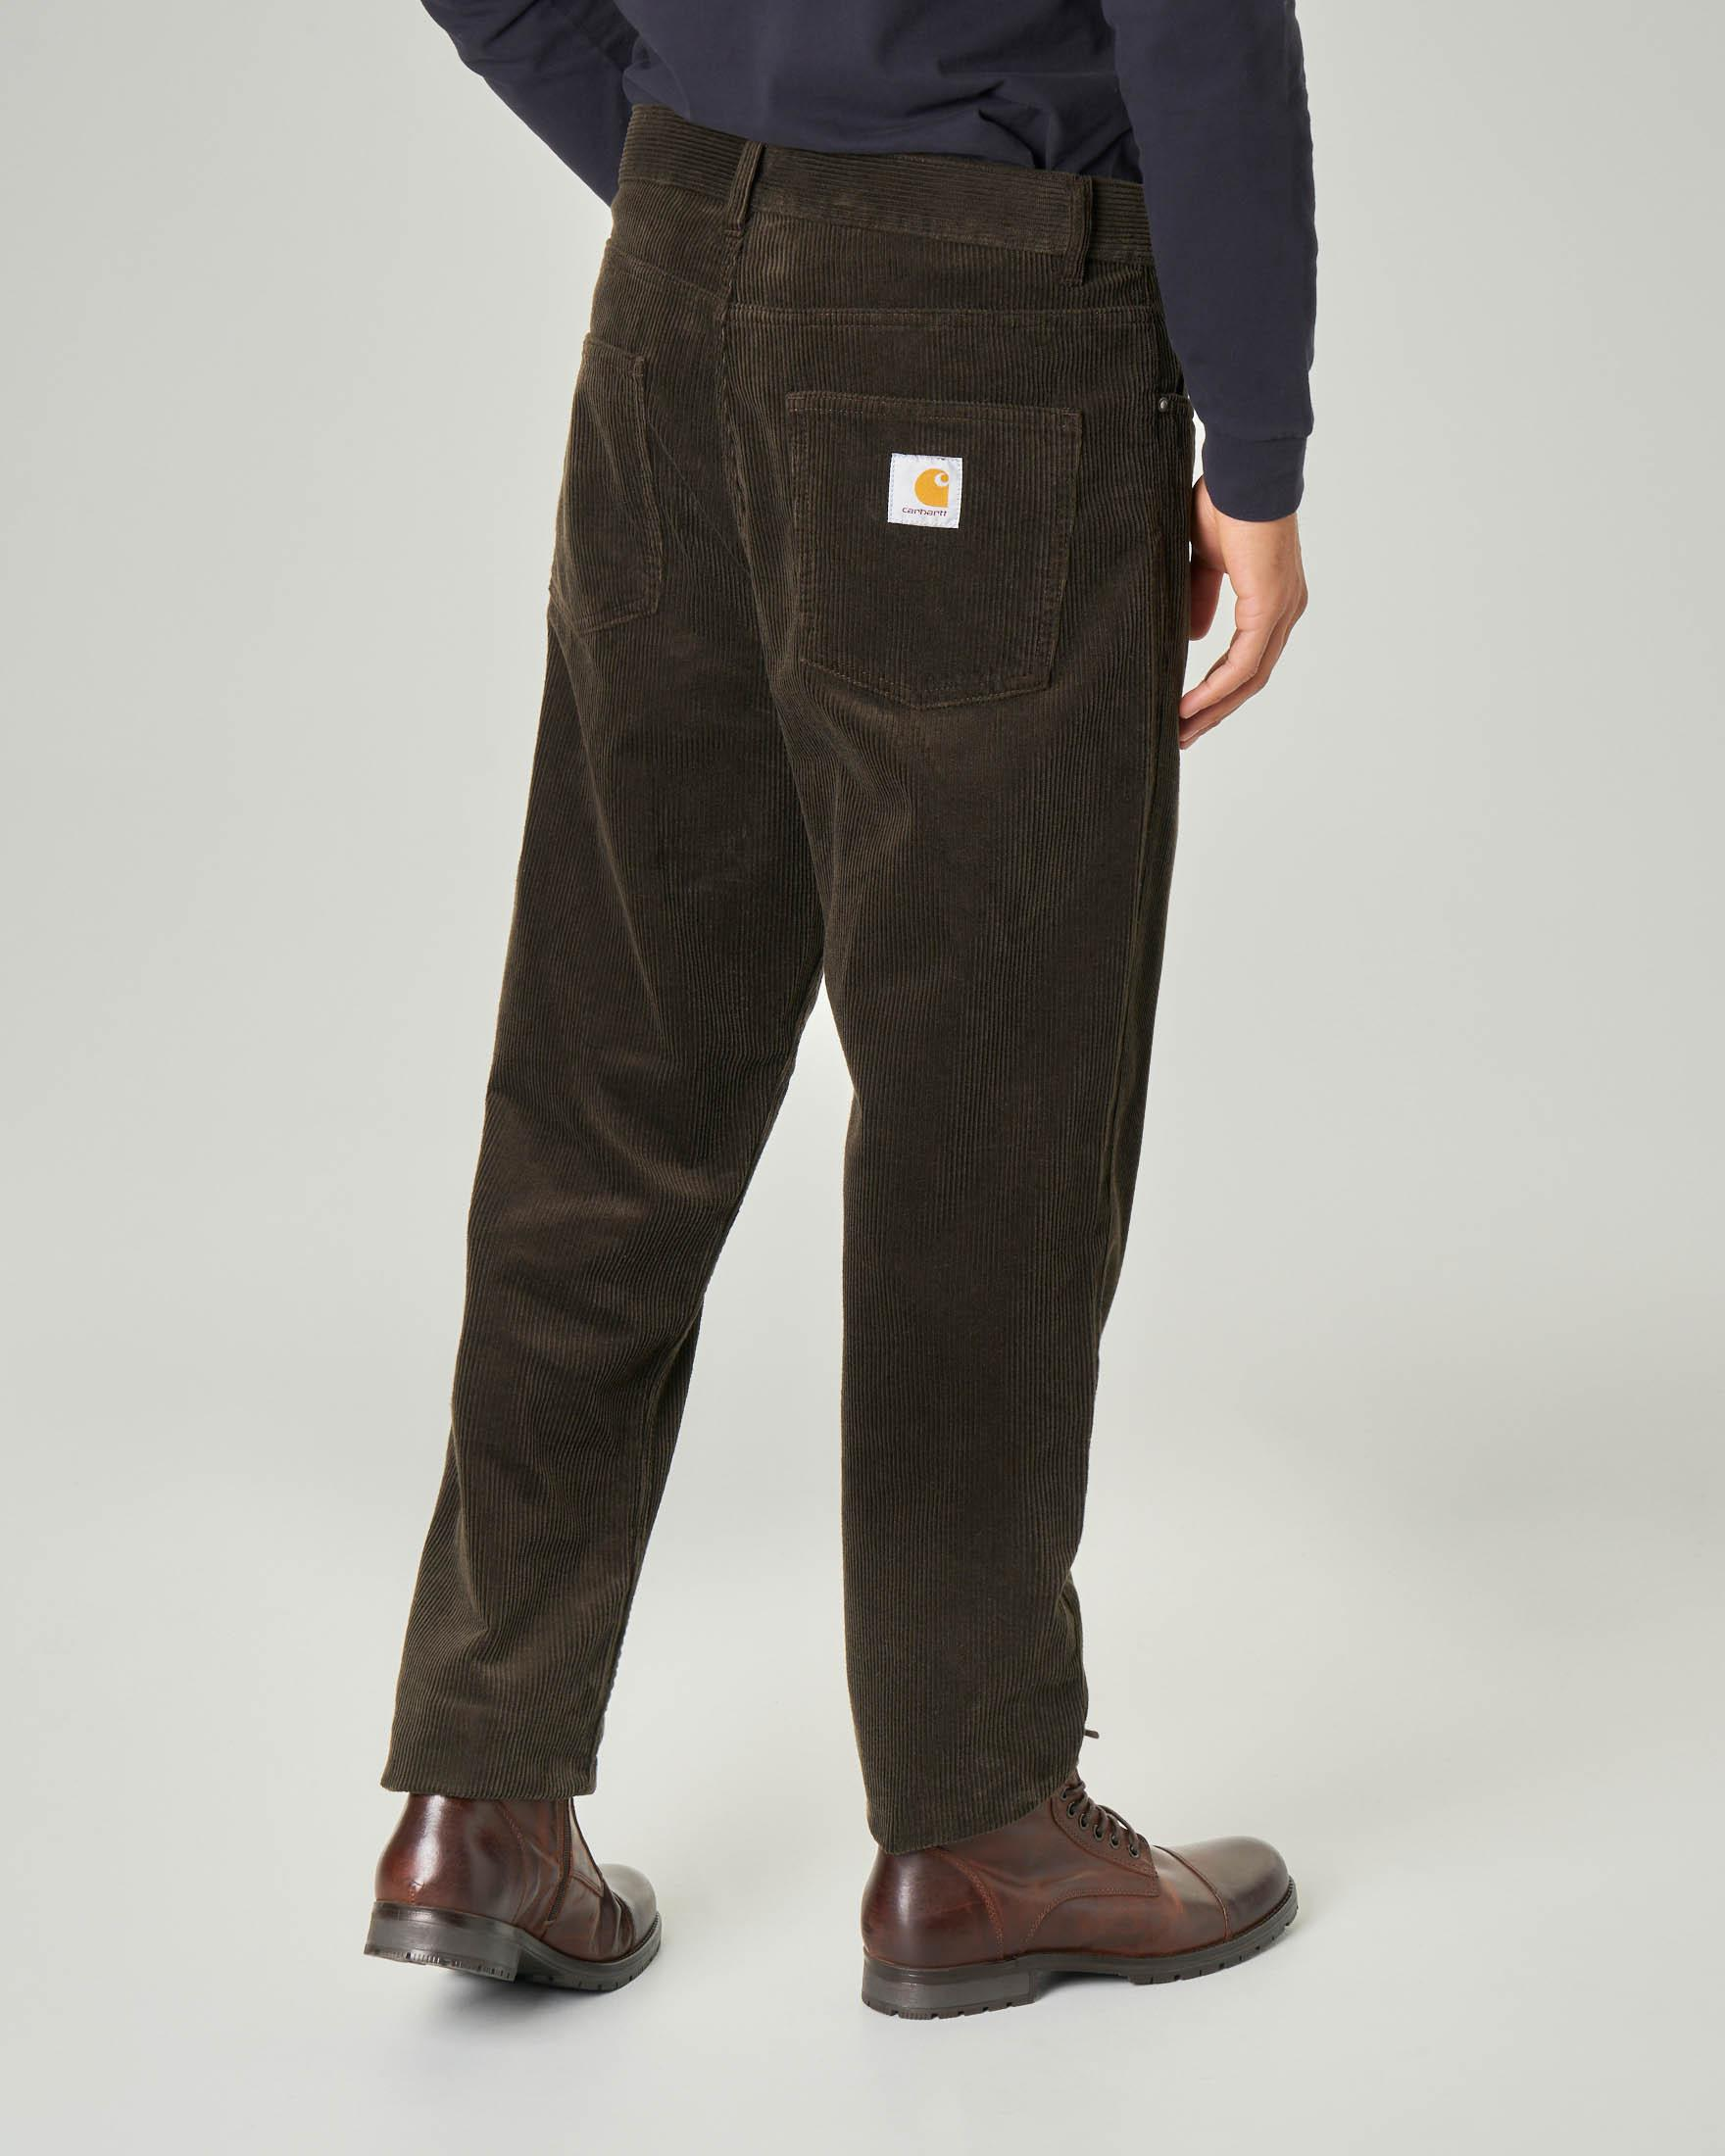 Pantalone carrot-fit marrone in velluto